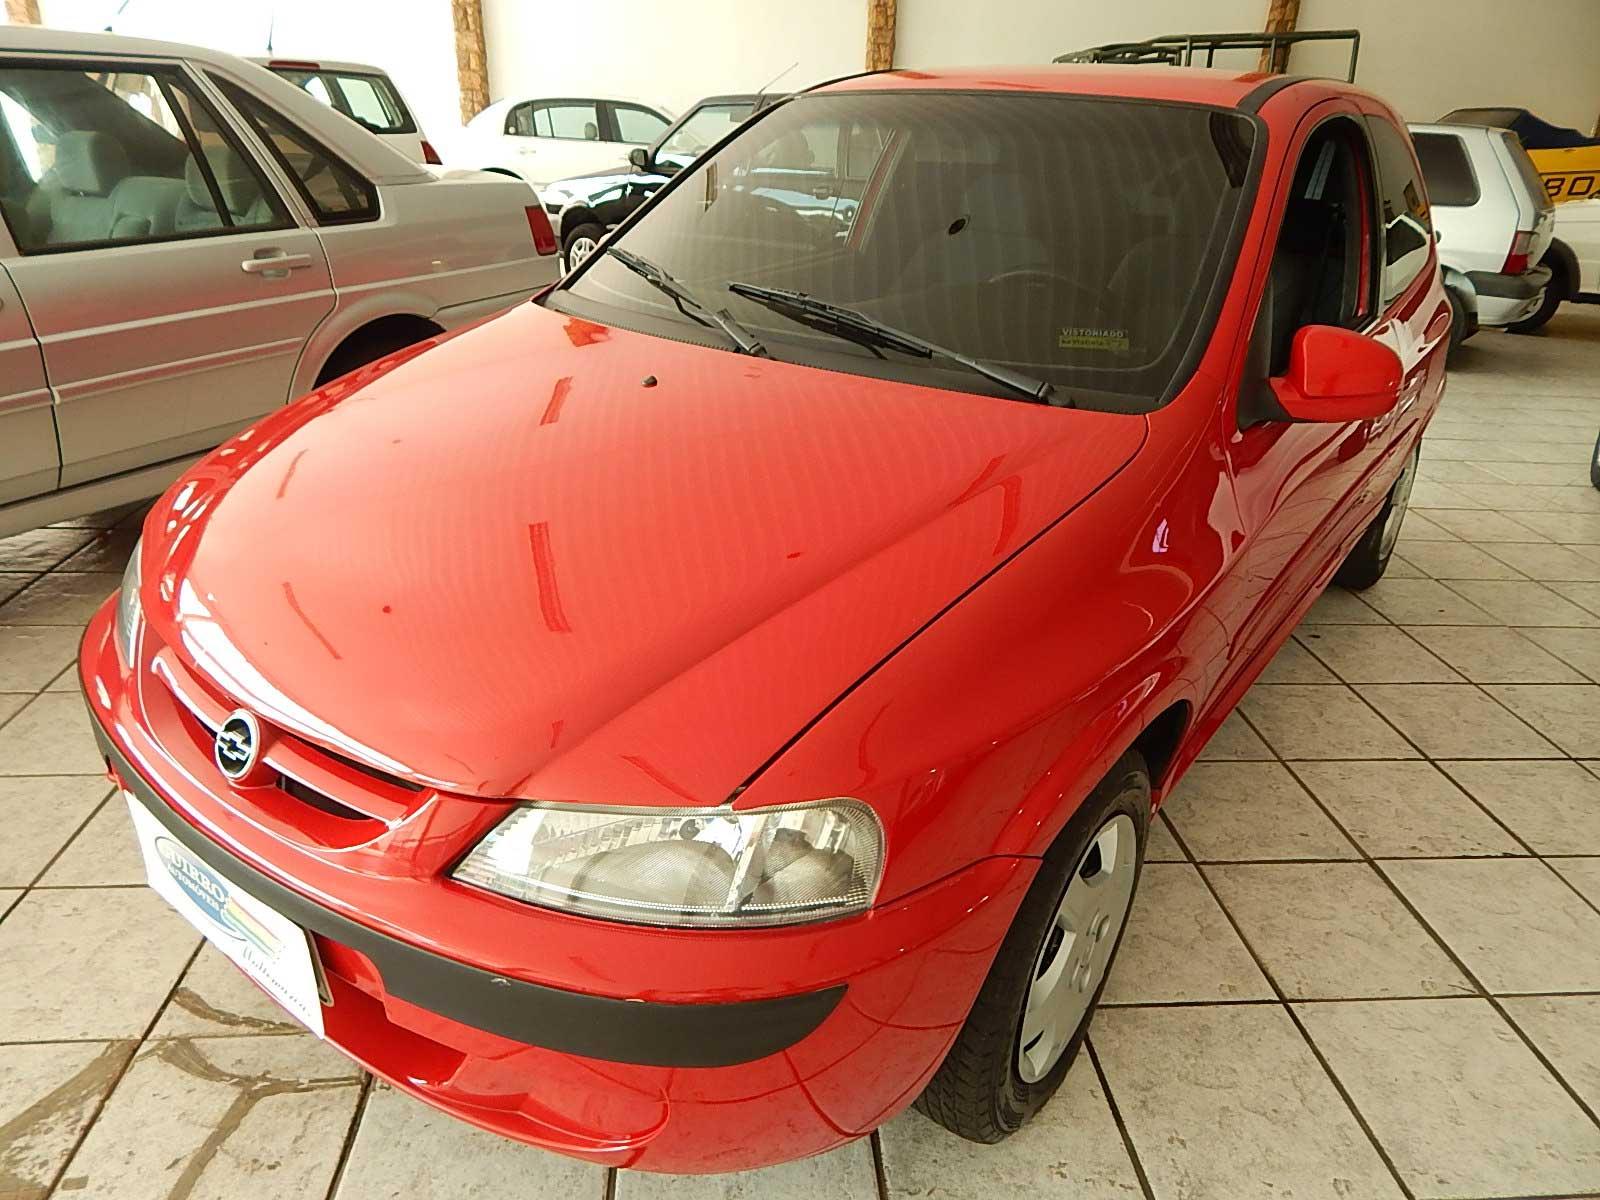 2001/2002 - Gasolina